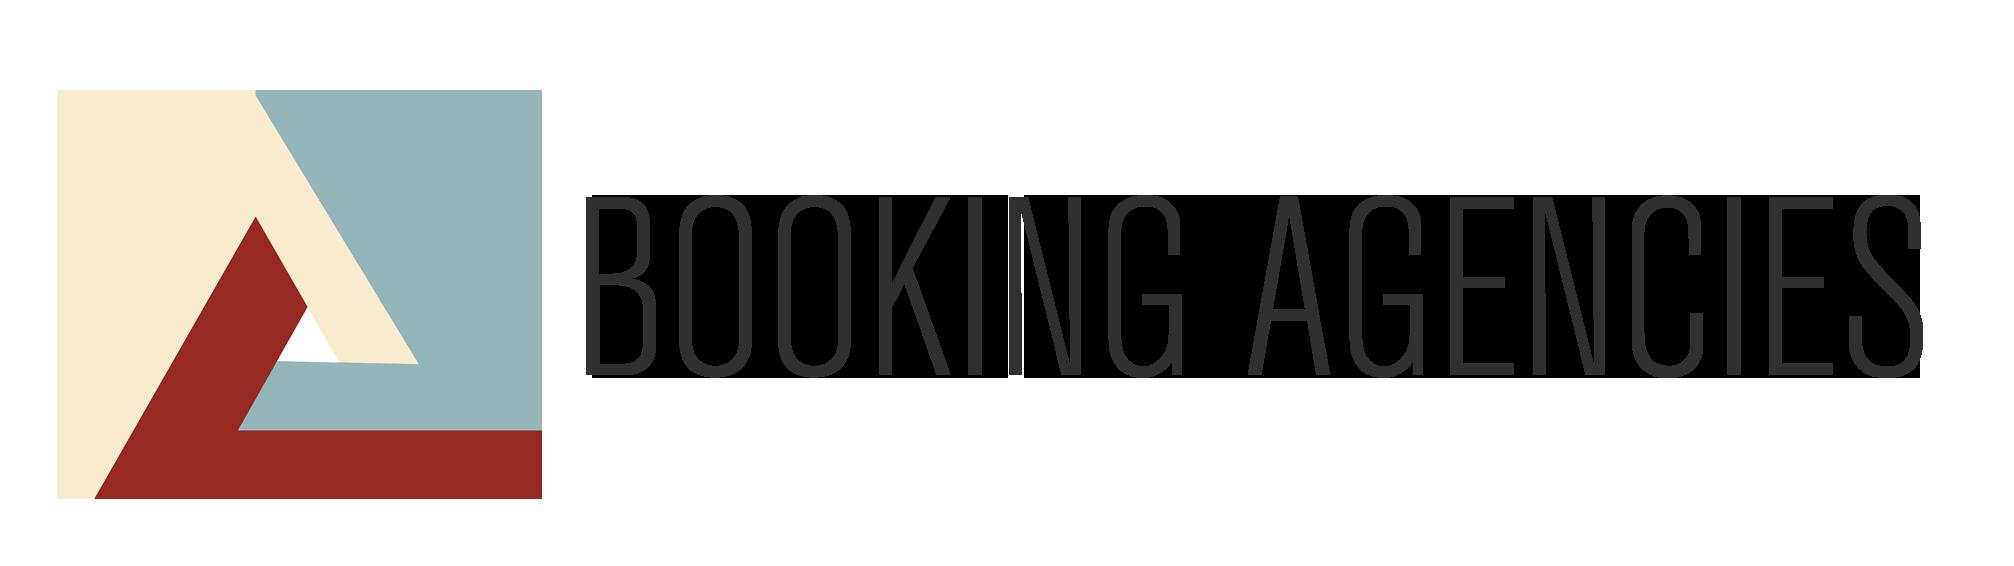 bookingagencies.png